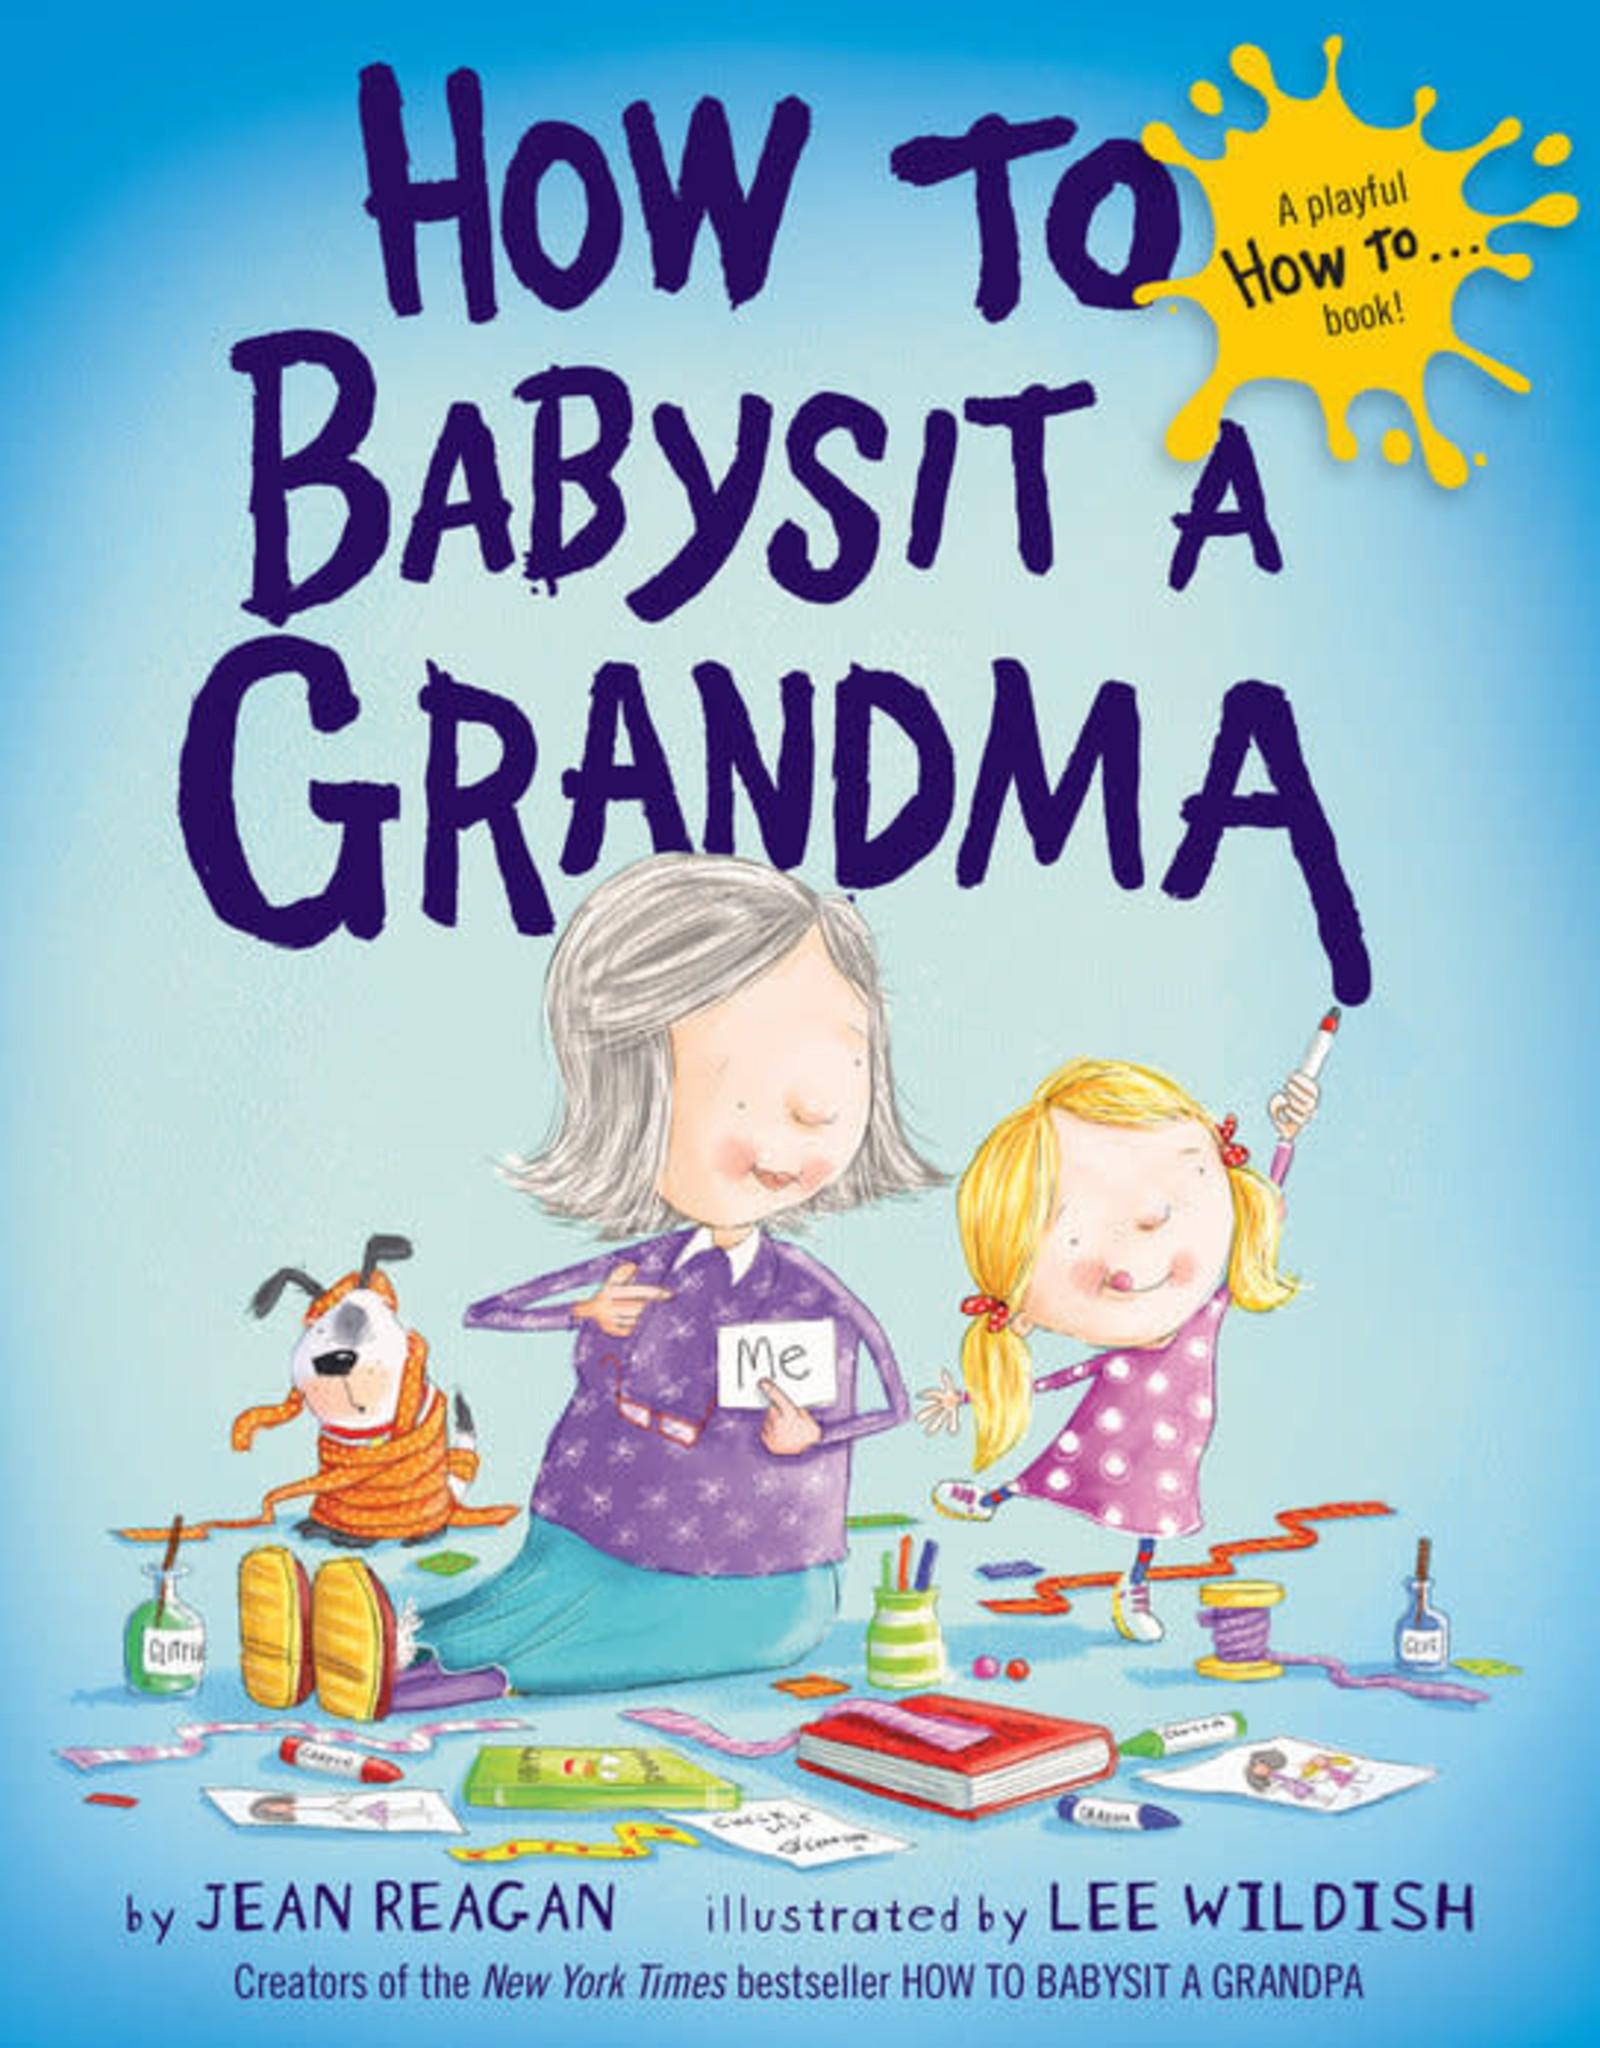 Jean Reagan How to Babysit a Grandma